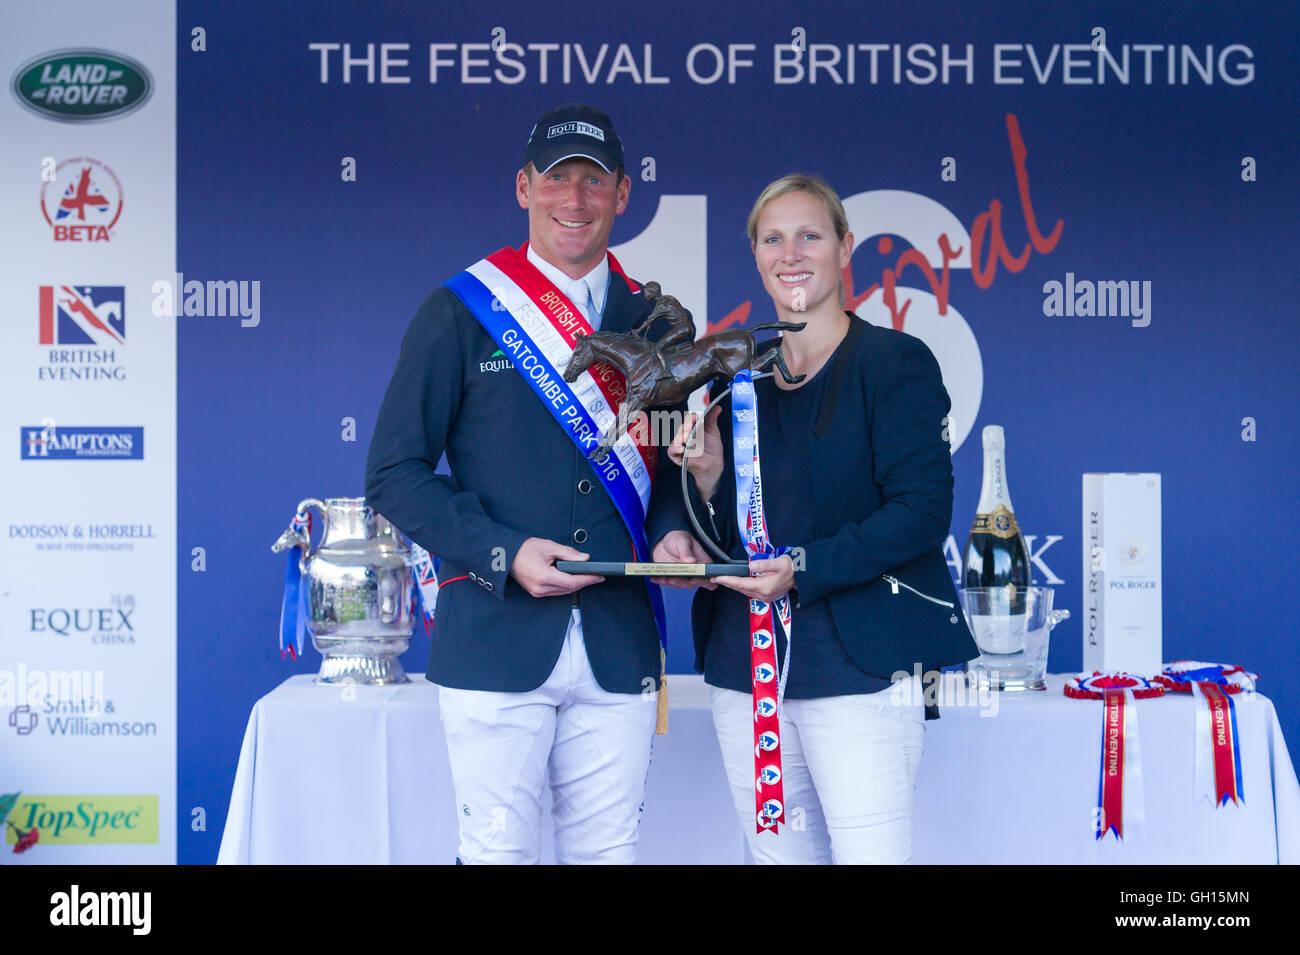 Festival of British Eventing, Gatcombe Park, Minchampton, Gloucestershire, England, 7th August 2016, Zara Tindall - Stock Image